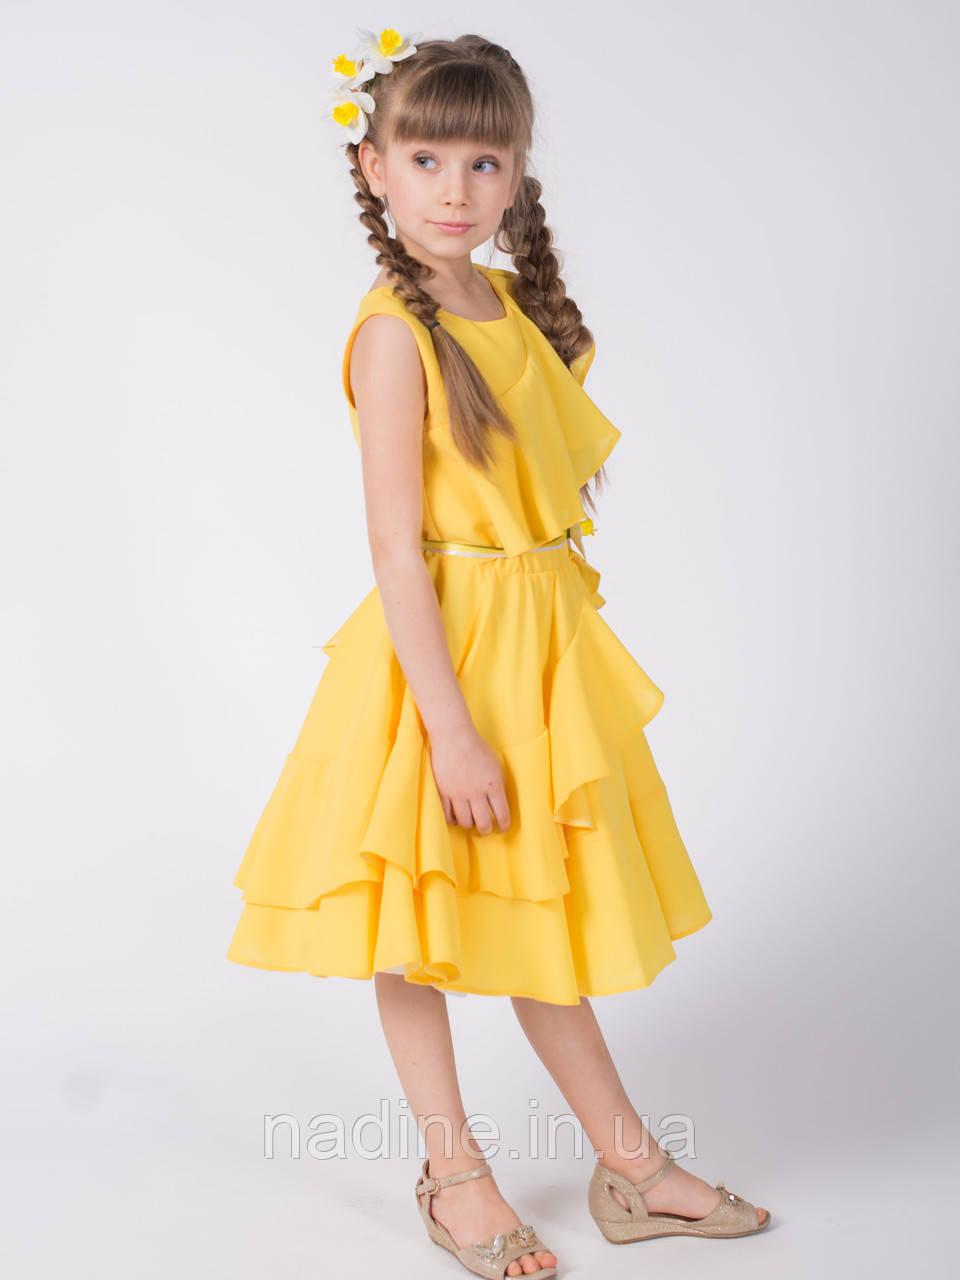 Сукня Nadine на дівчинку, Yellow Narcissus ріст 128. Жовте